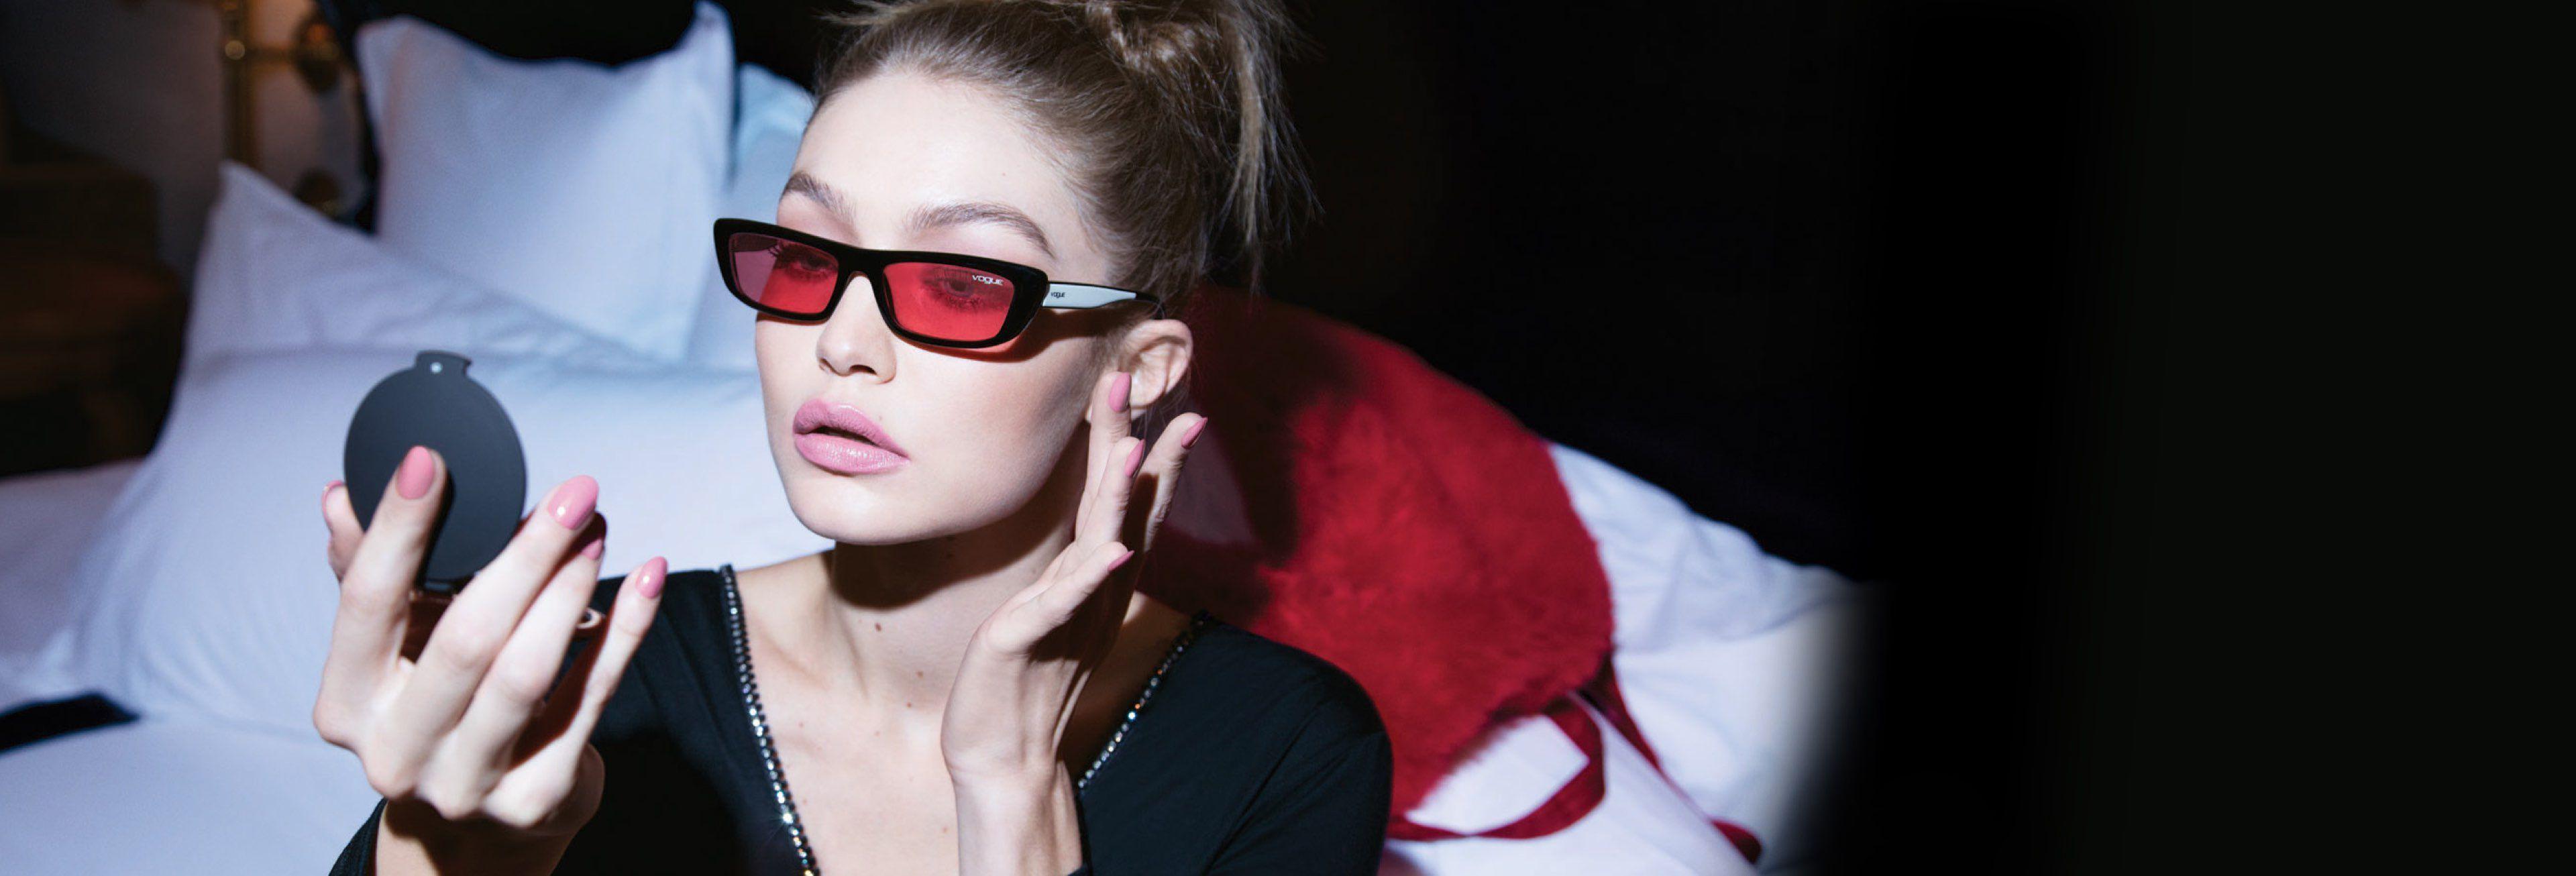 ba0d45ca8 Coleção Gigi Hadid 2019 | Vogue Eyewear VogueBR